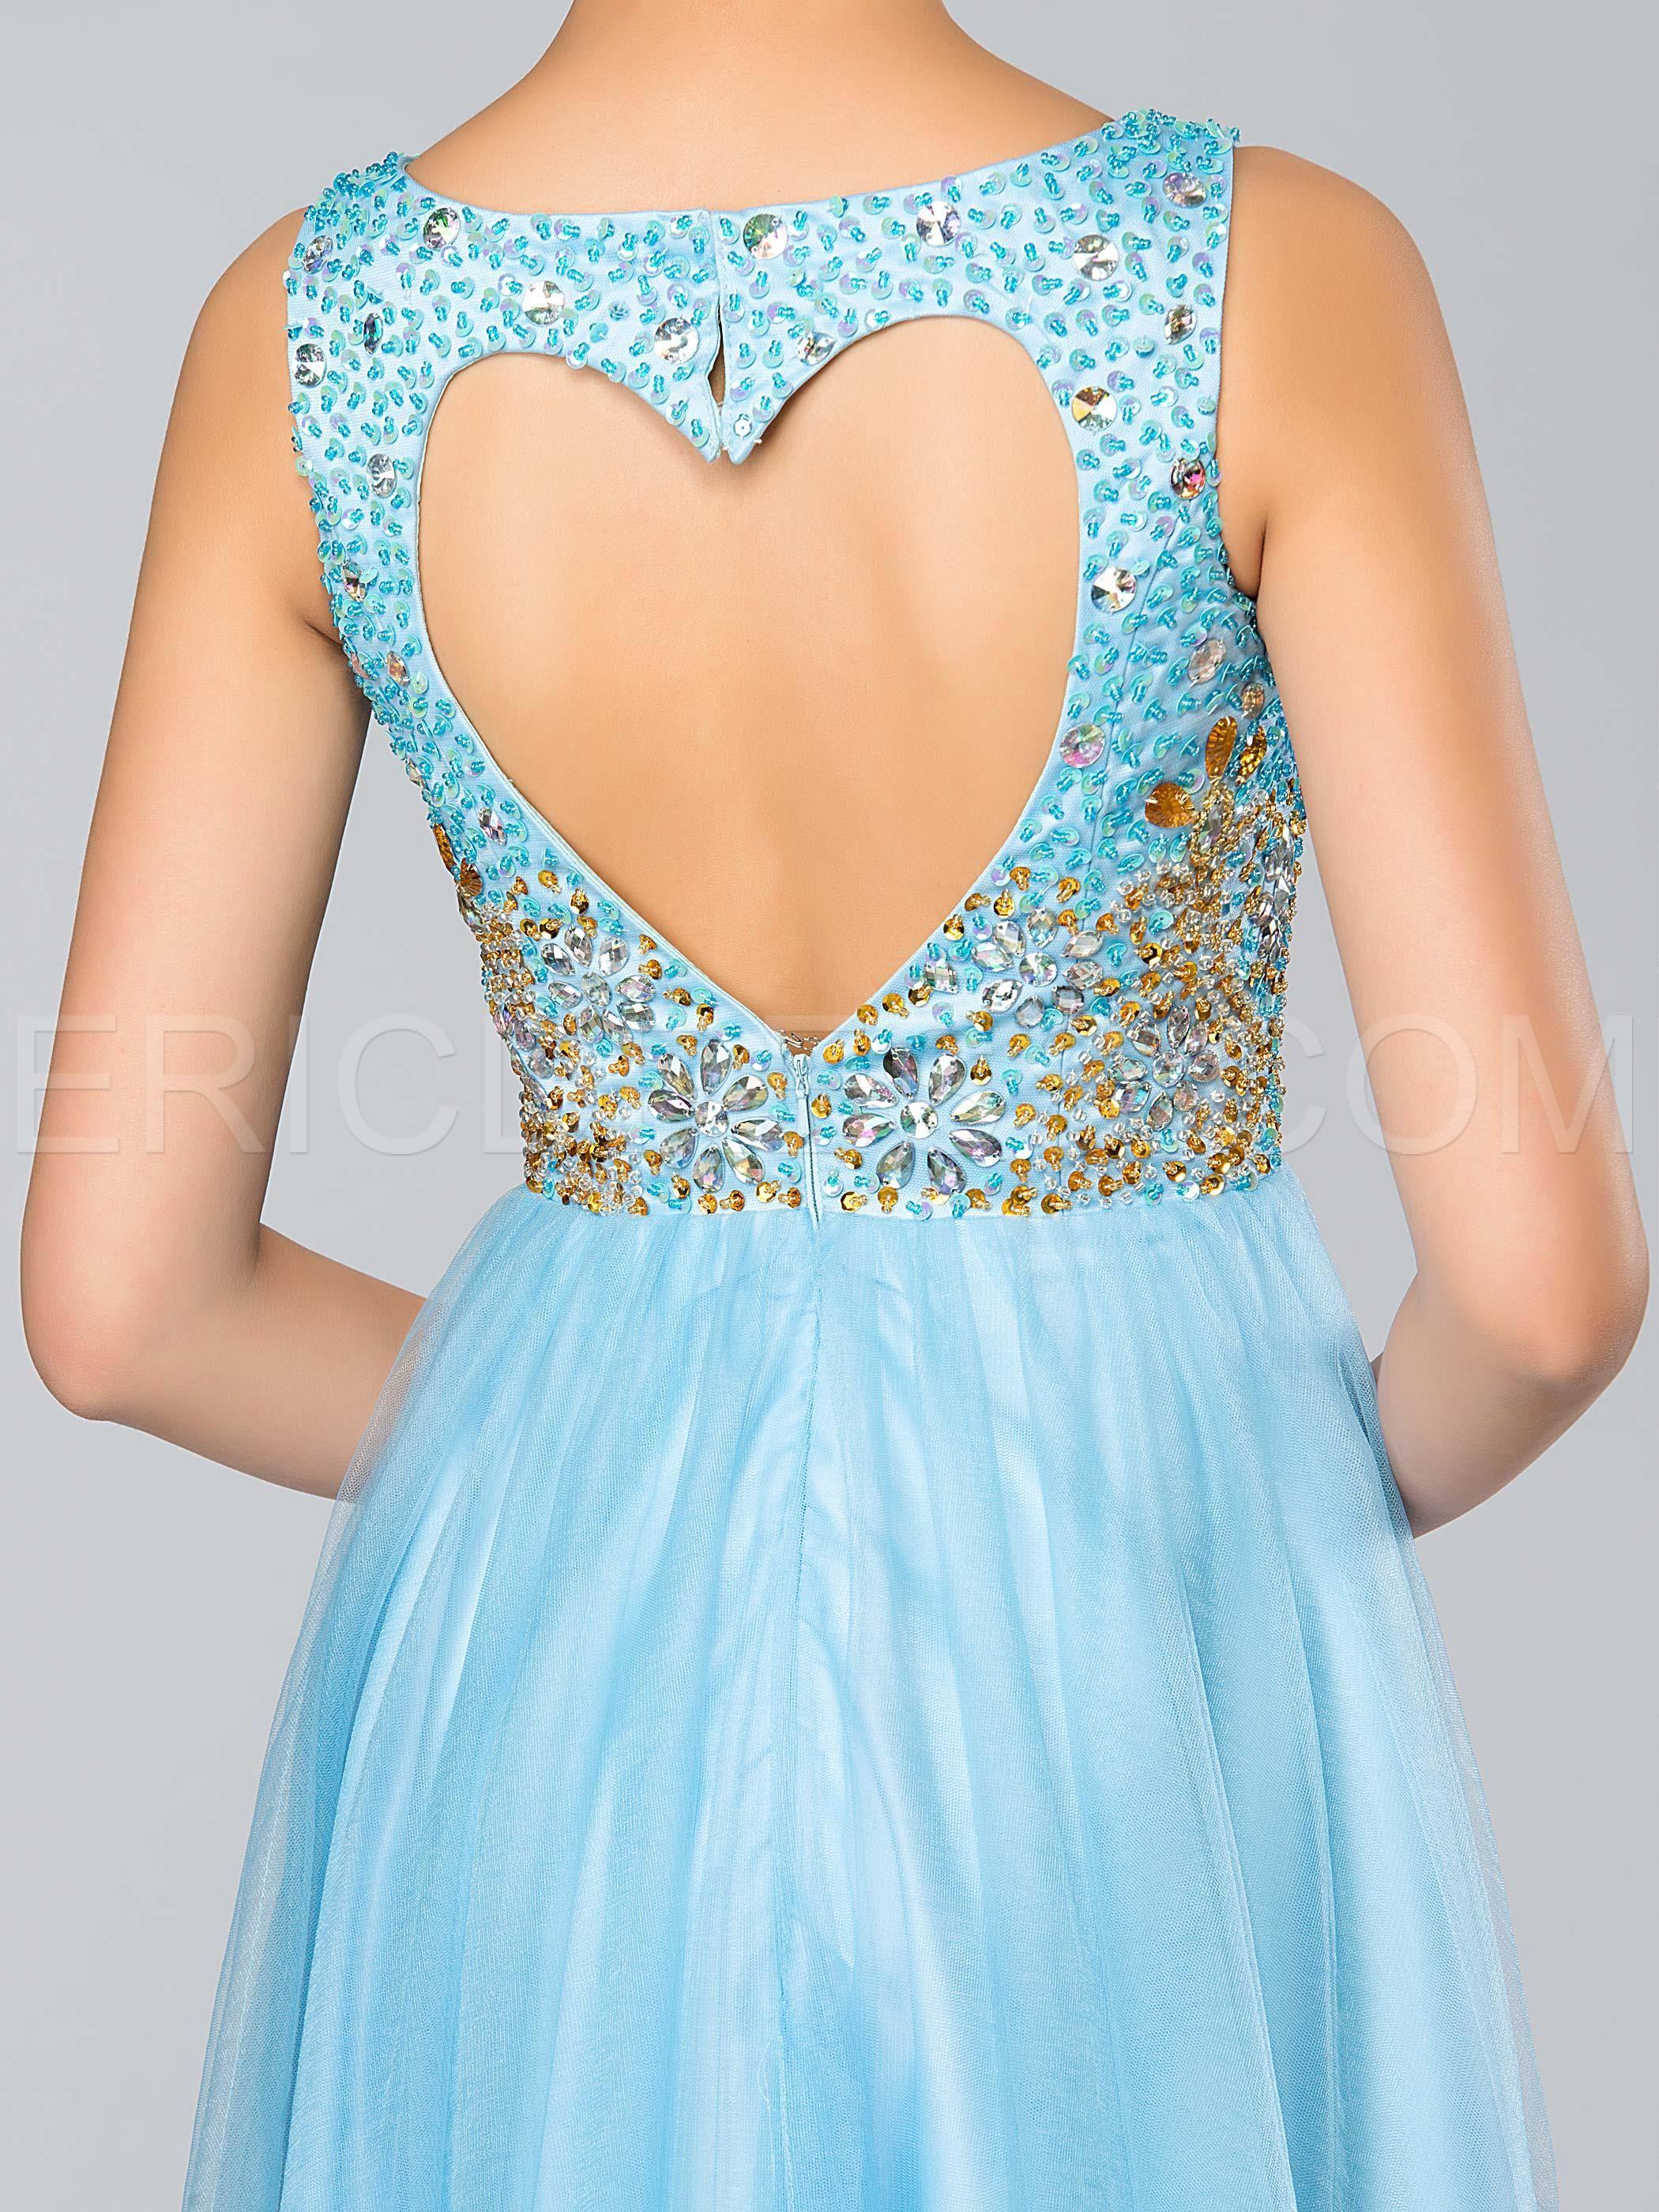 Shiny vneck beading backless aline long prom dress long prom